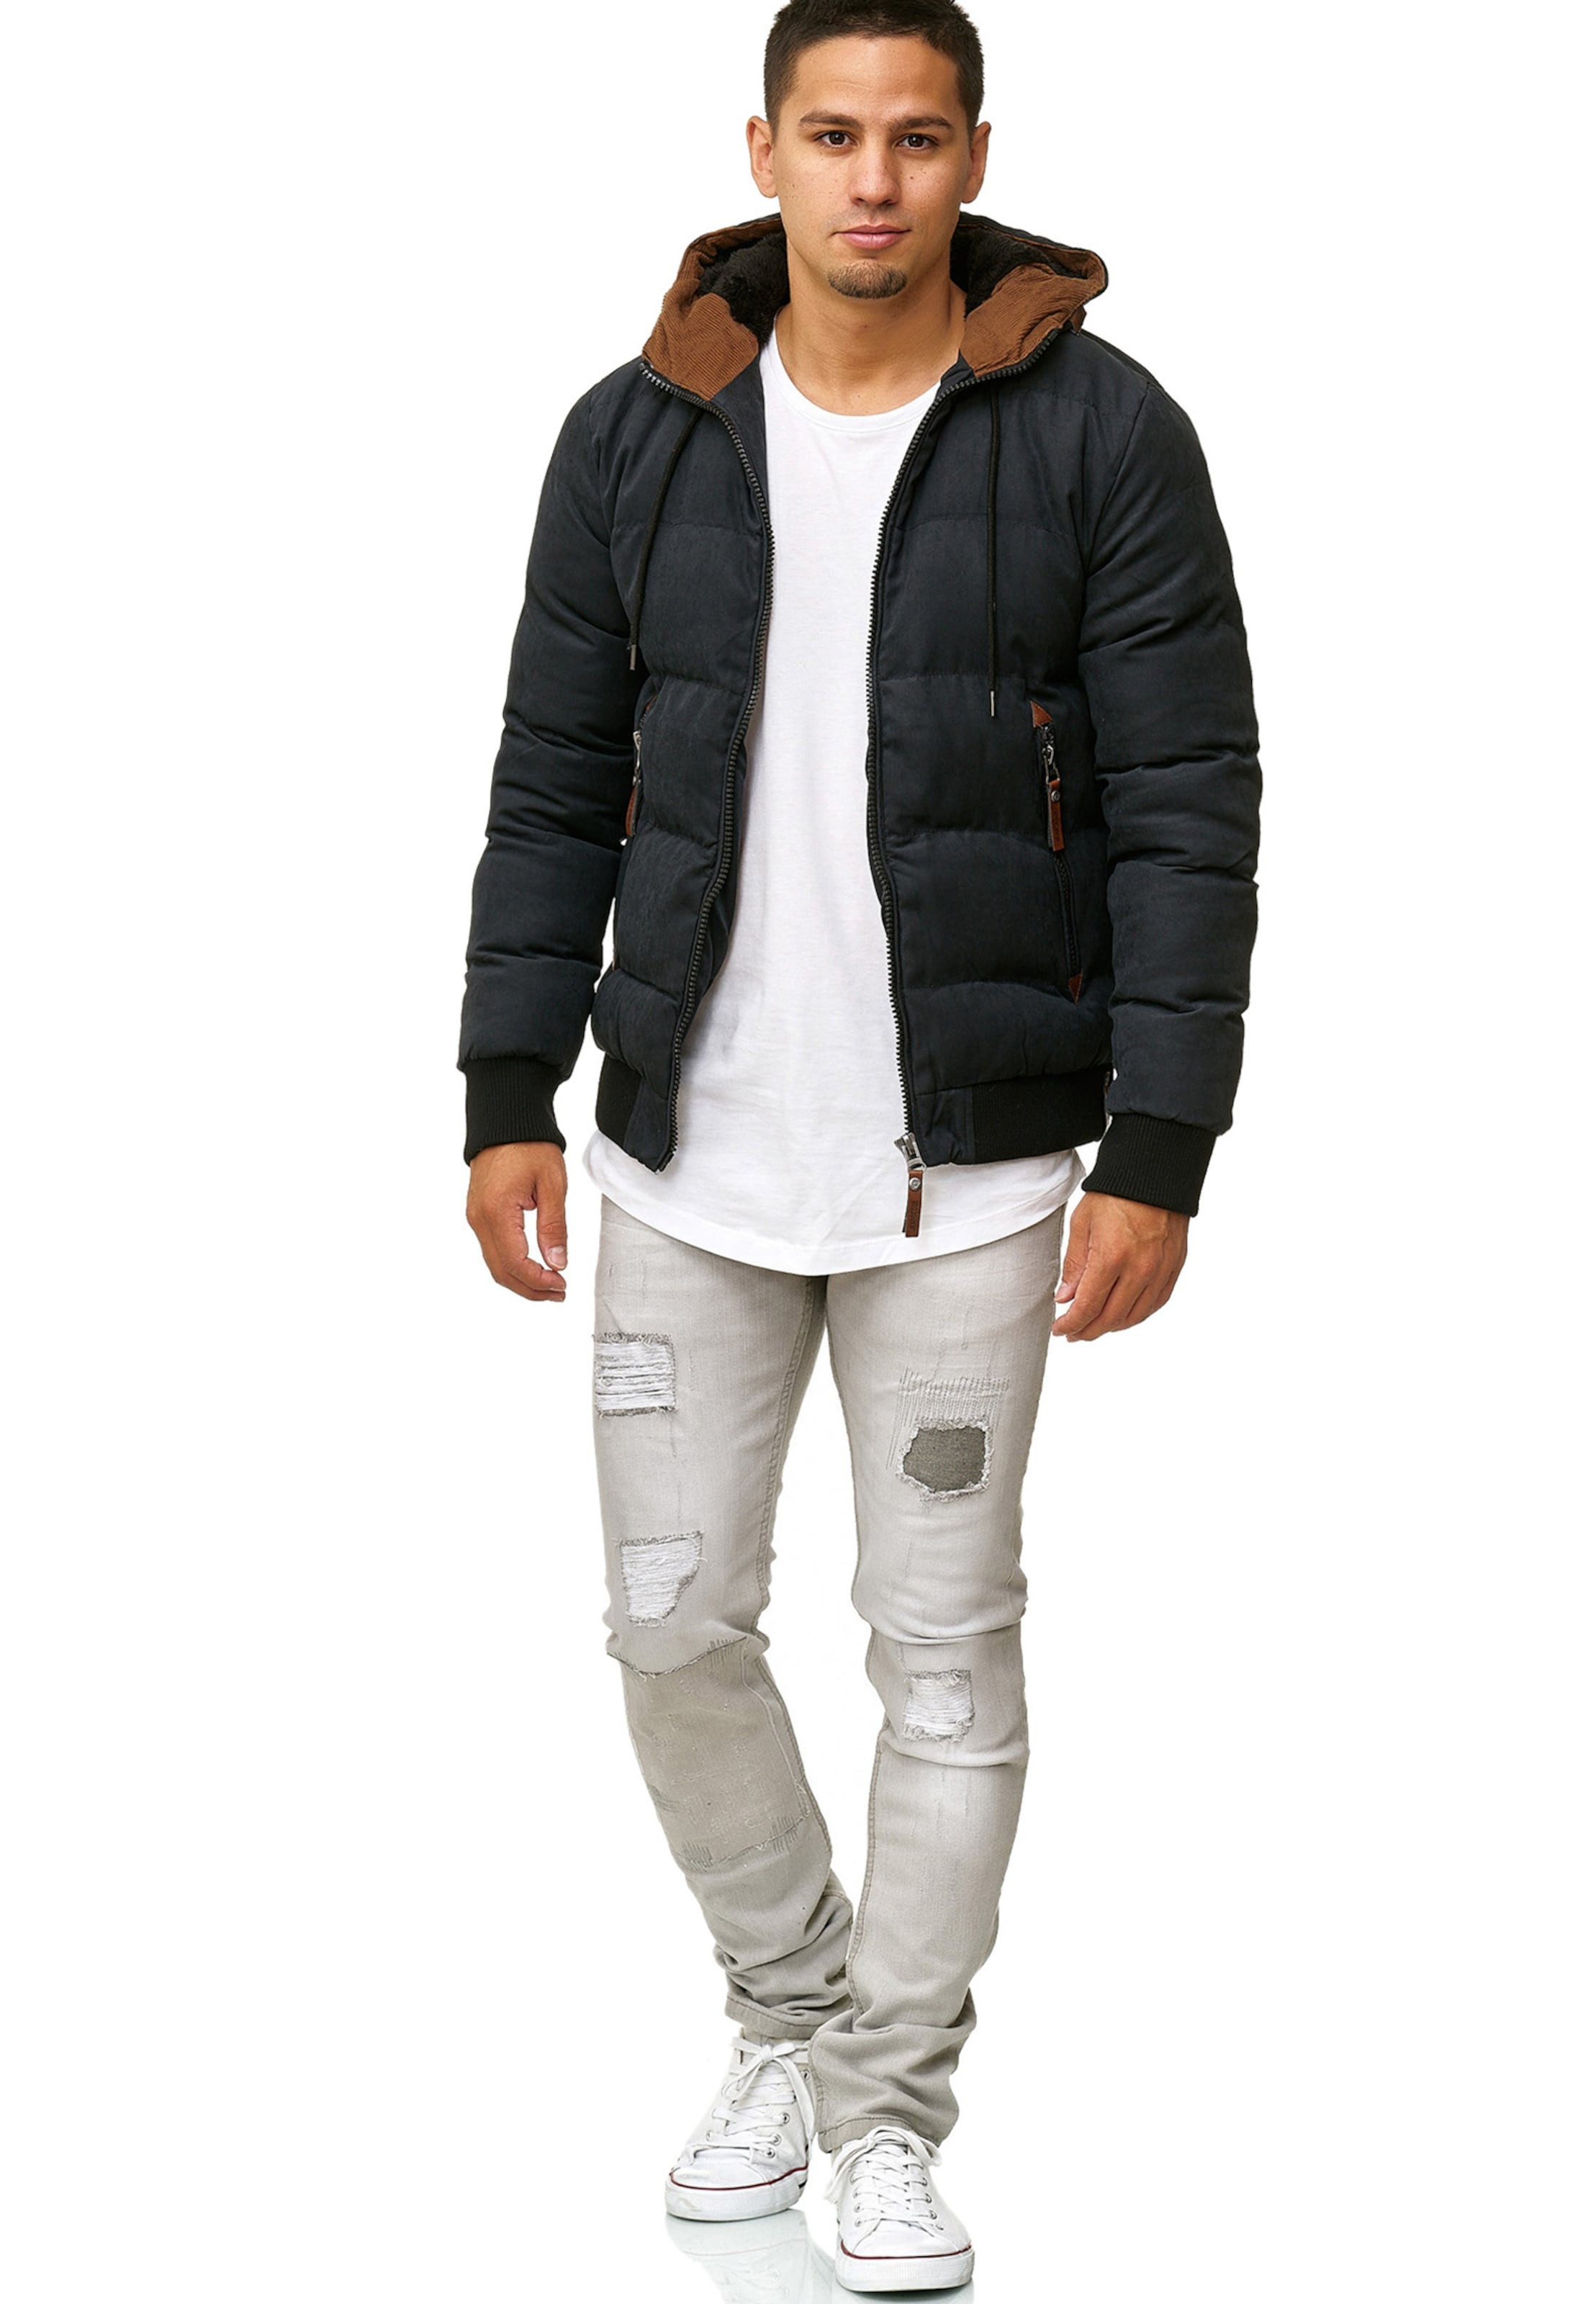 Veste D'hiver Indicode 'adeline' CognacNoir Jeans En TFKJ3l1c